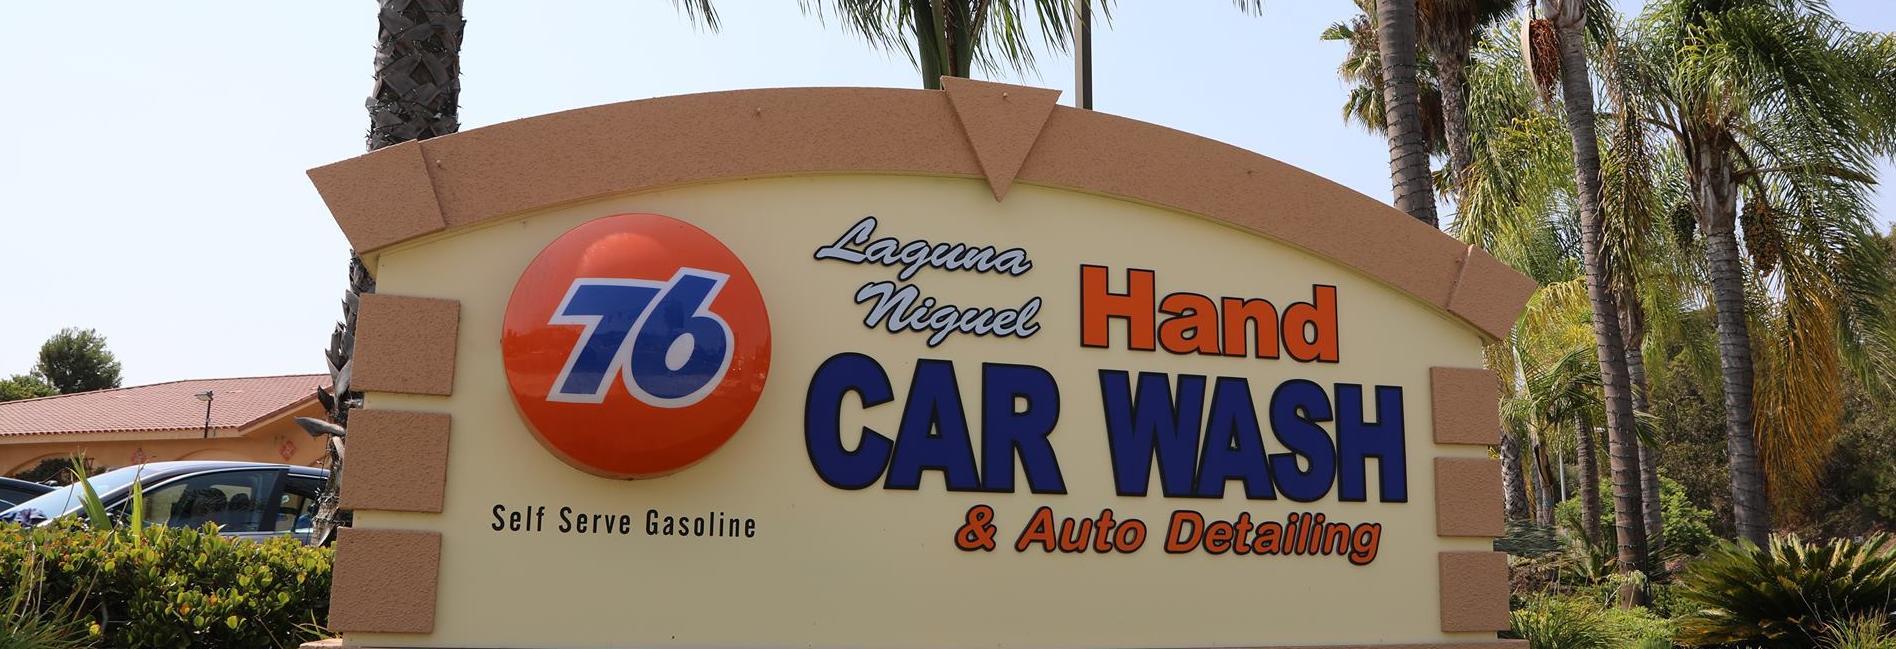 laguna niguel car wash logo laguna niguel ca car wash coupons near me